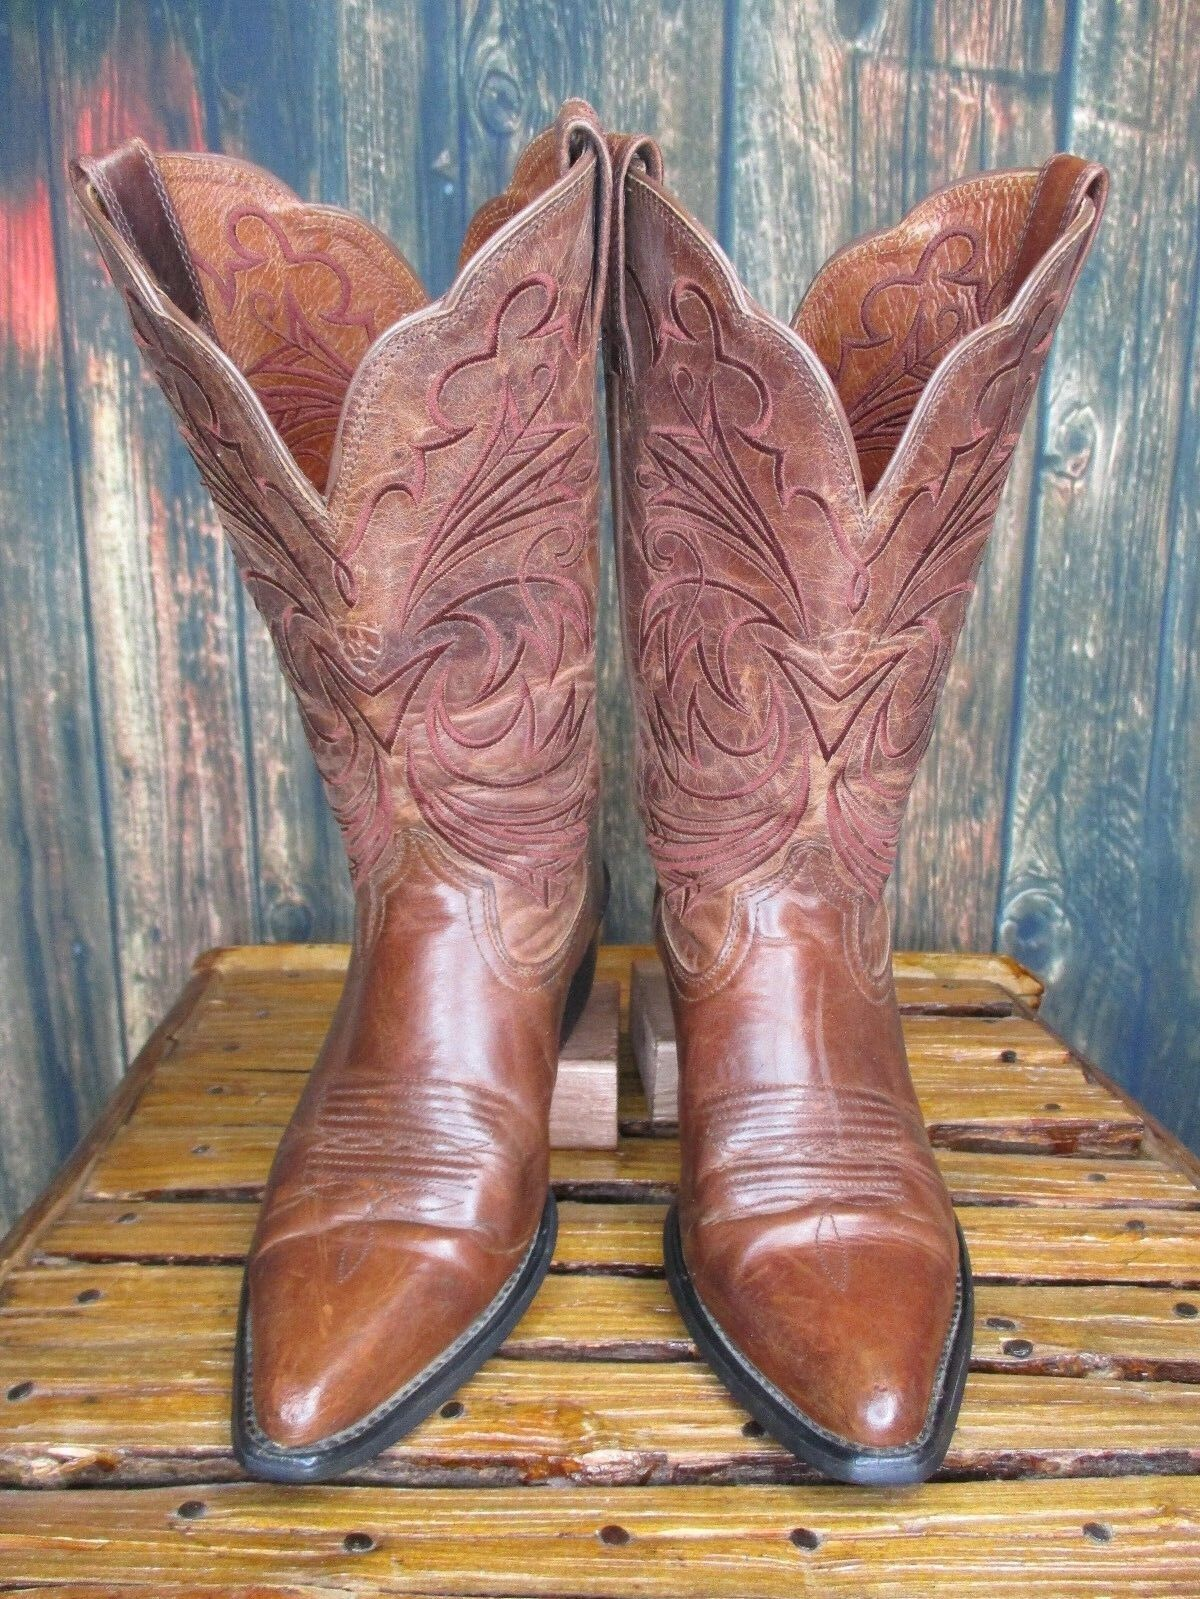 Ladies Ariat Brown Leather Pointed Toe Western Cowboy Cowboy Cowboy Boots sz  6.5 B c68f1f